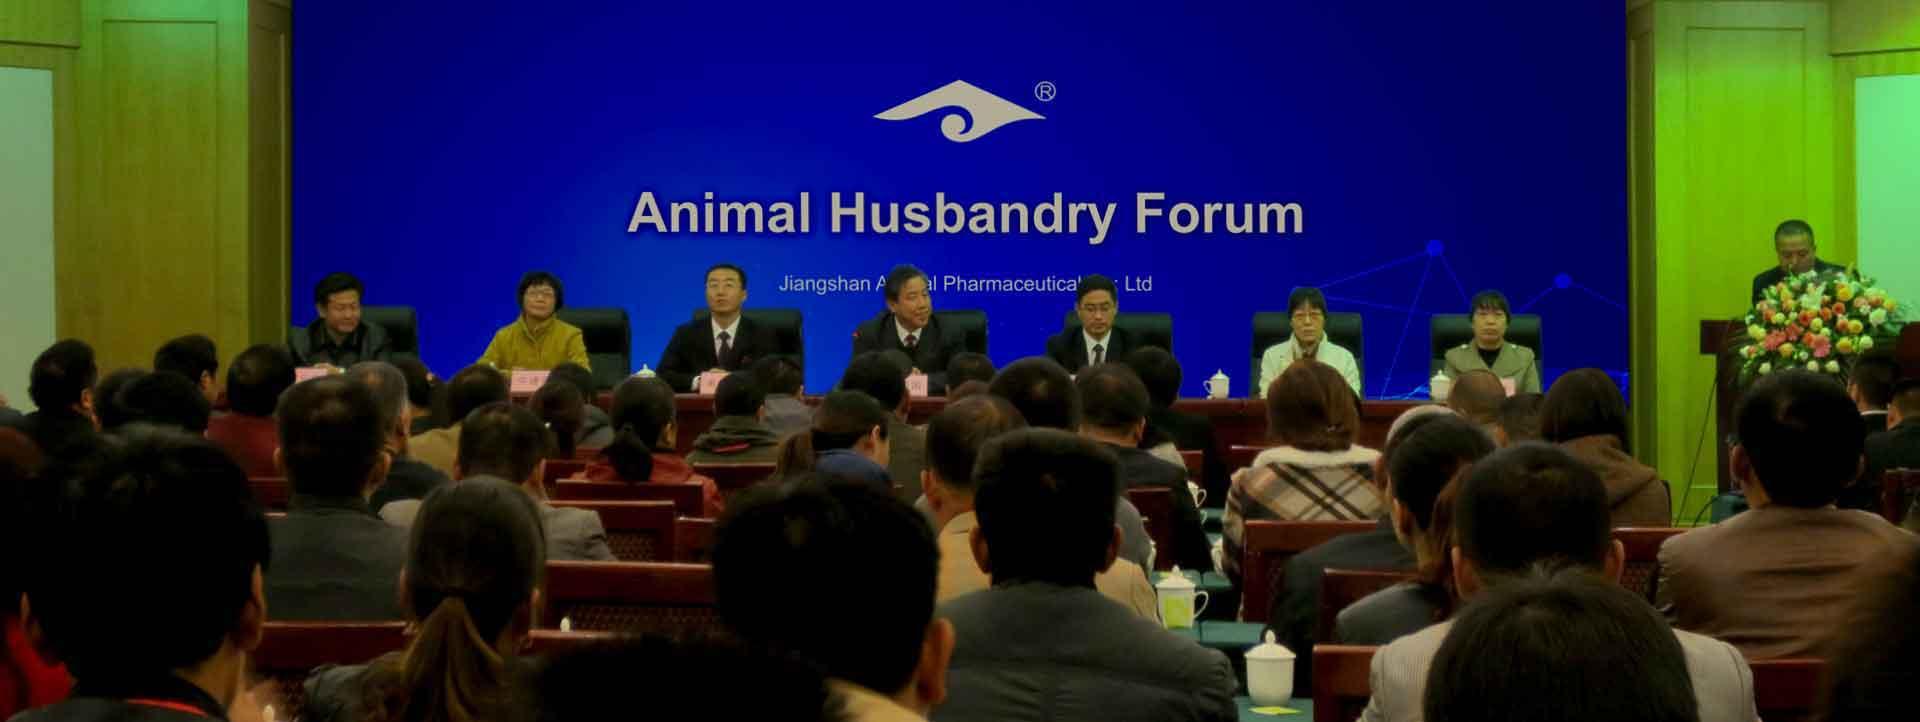 animal pharmacy forum